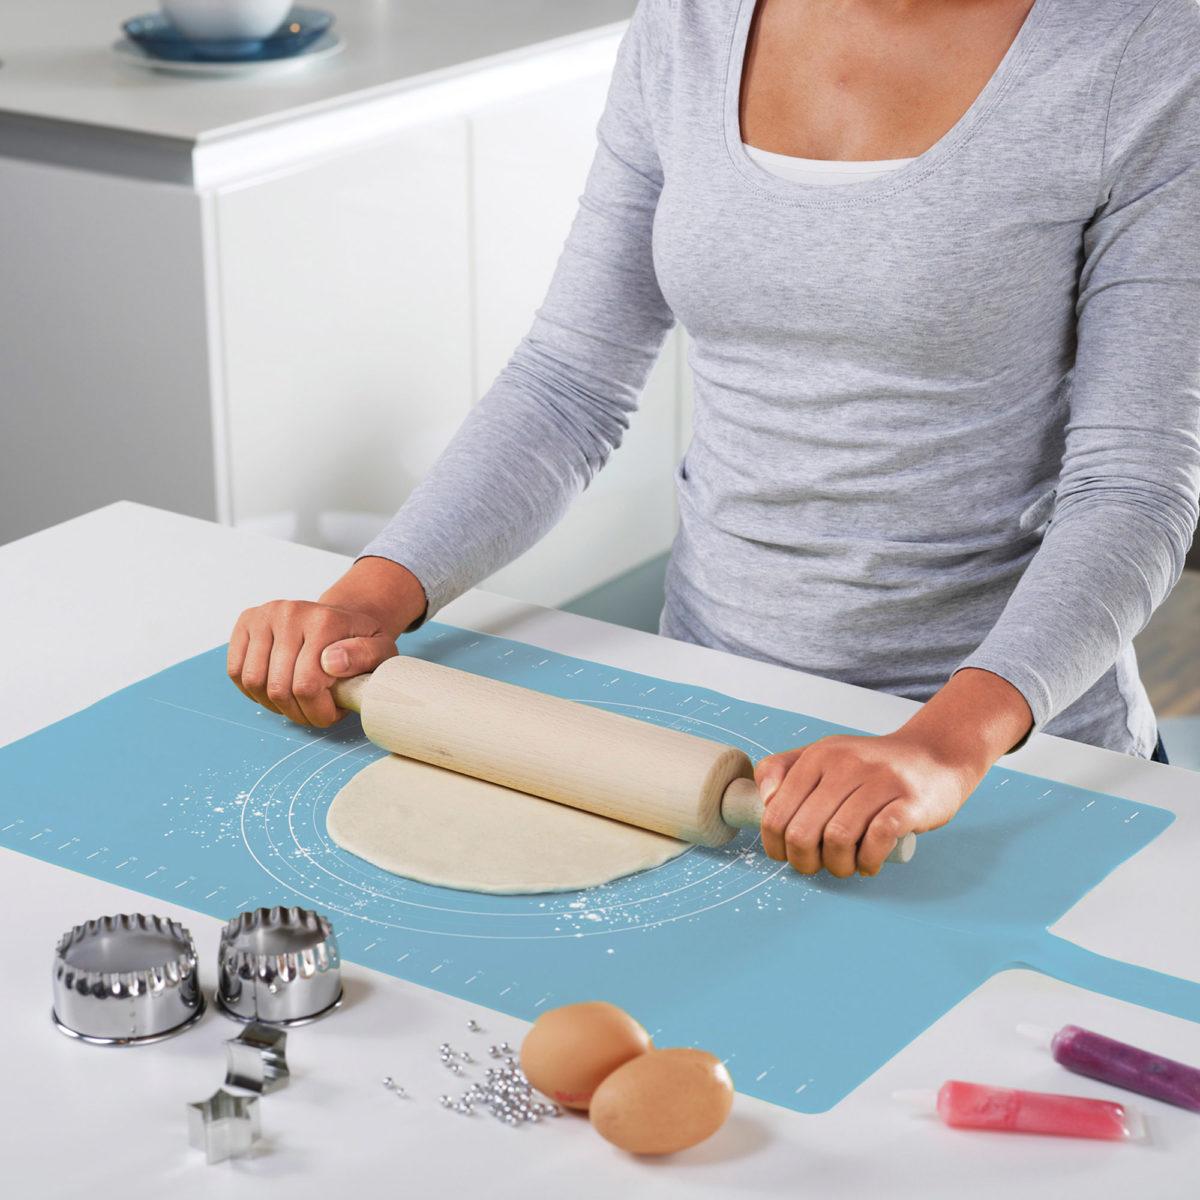 3yellow-octopus_joseph-joseph-roll-up-non-slip-silicone-pastry-mat-1200x1200.jpg